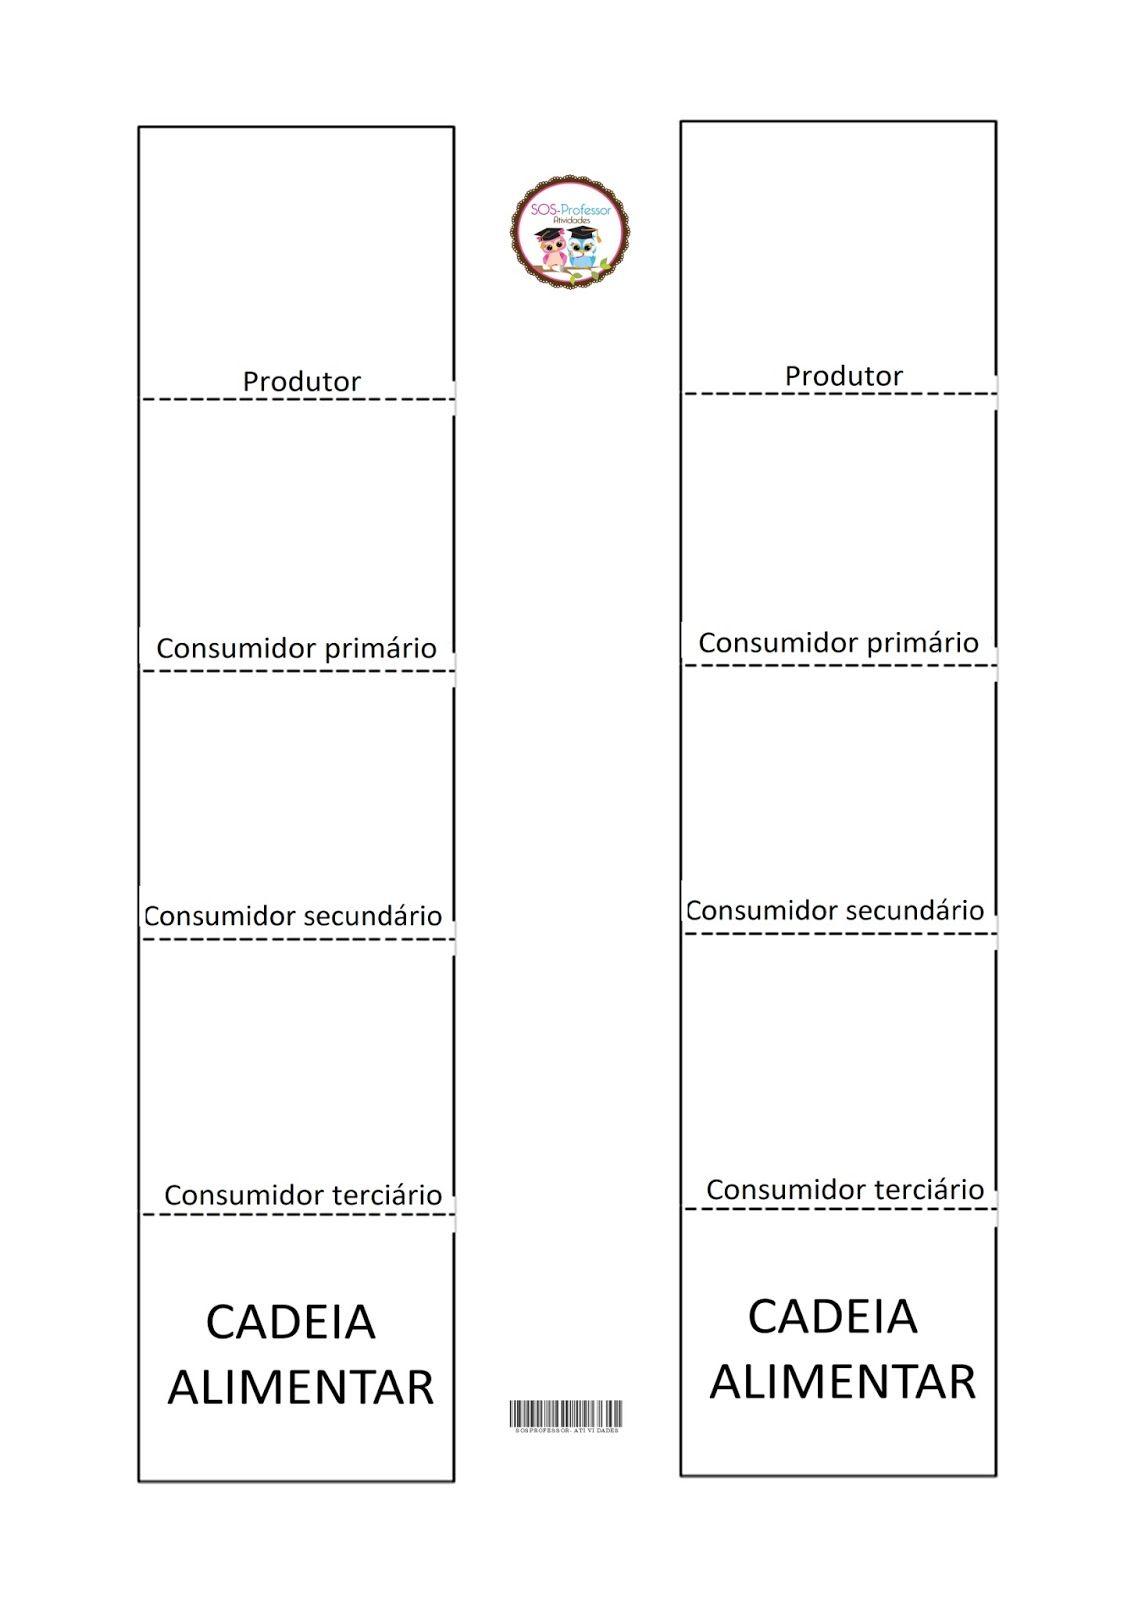 Cadeia Alimentar Atividade Interativa Cadernos Interativos